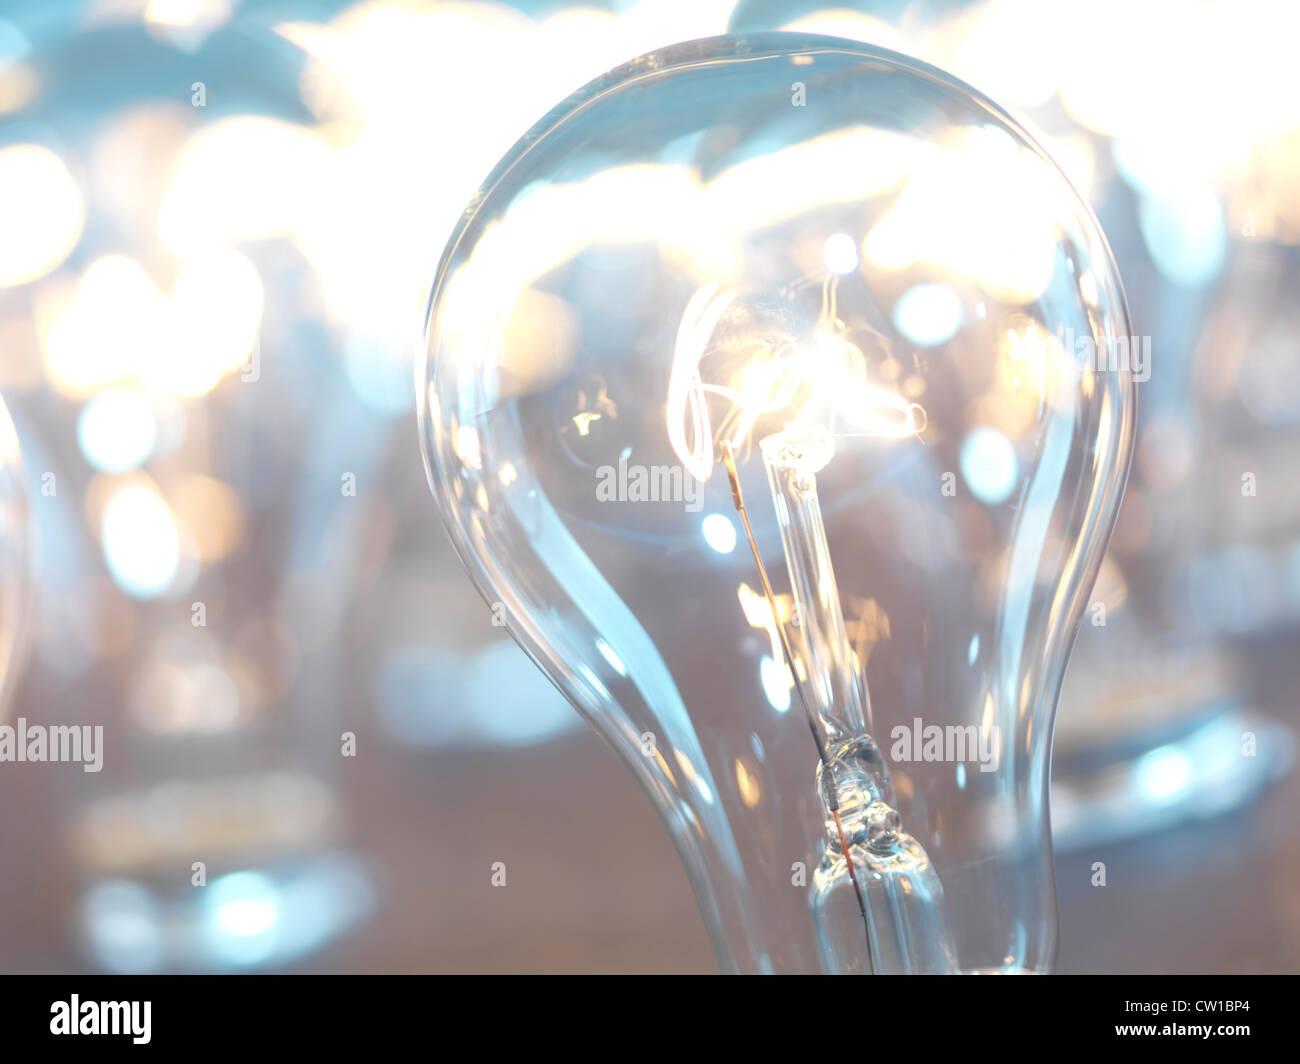 Closeup of lit up incandescent light bulbs. Power consumption concept. - Stock Image